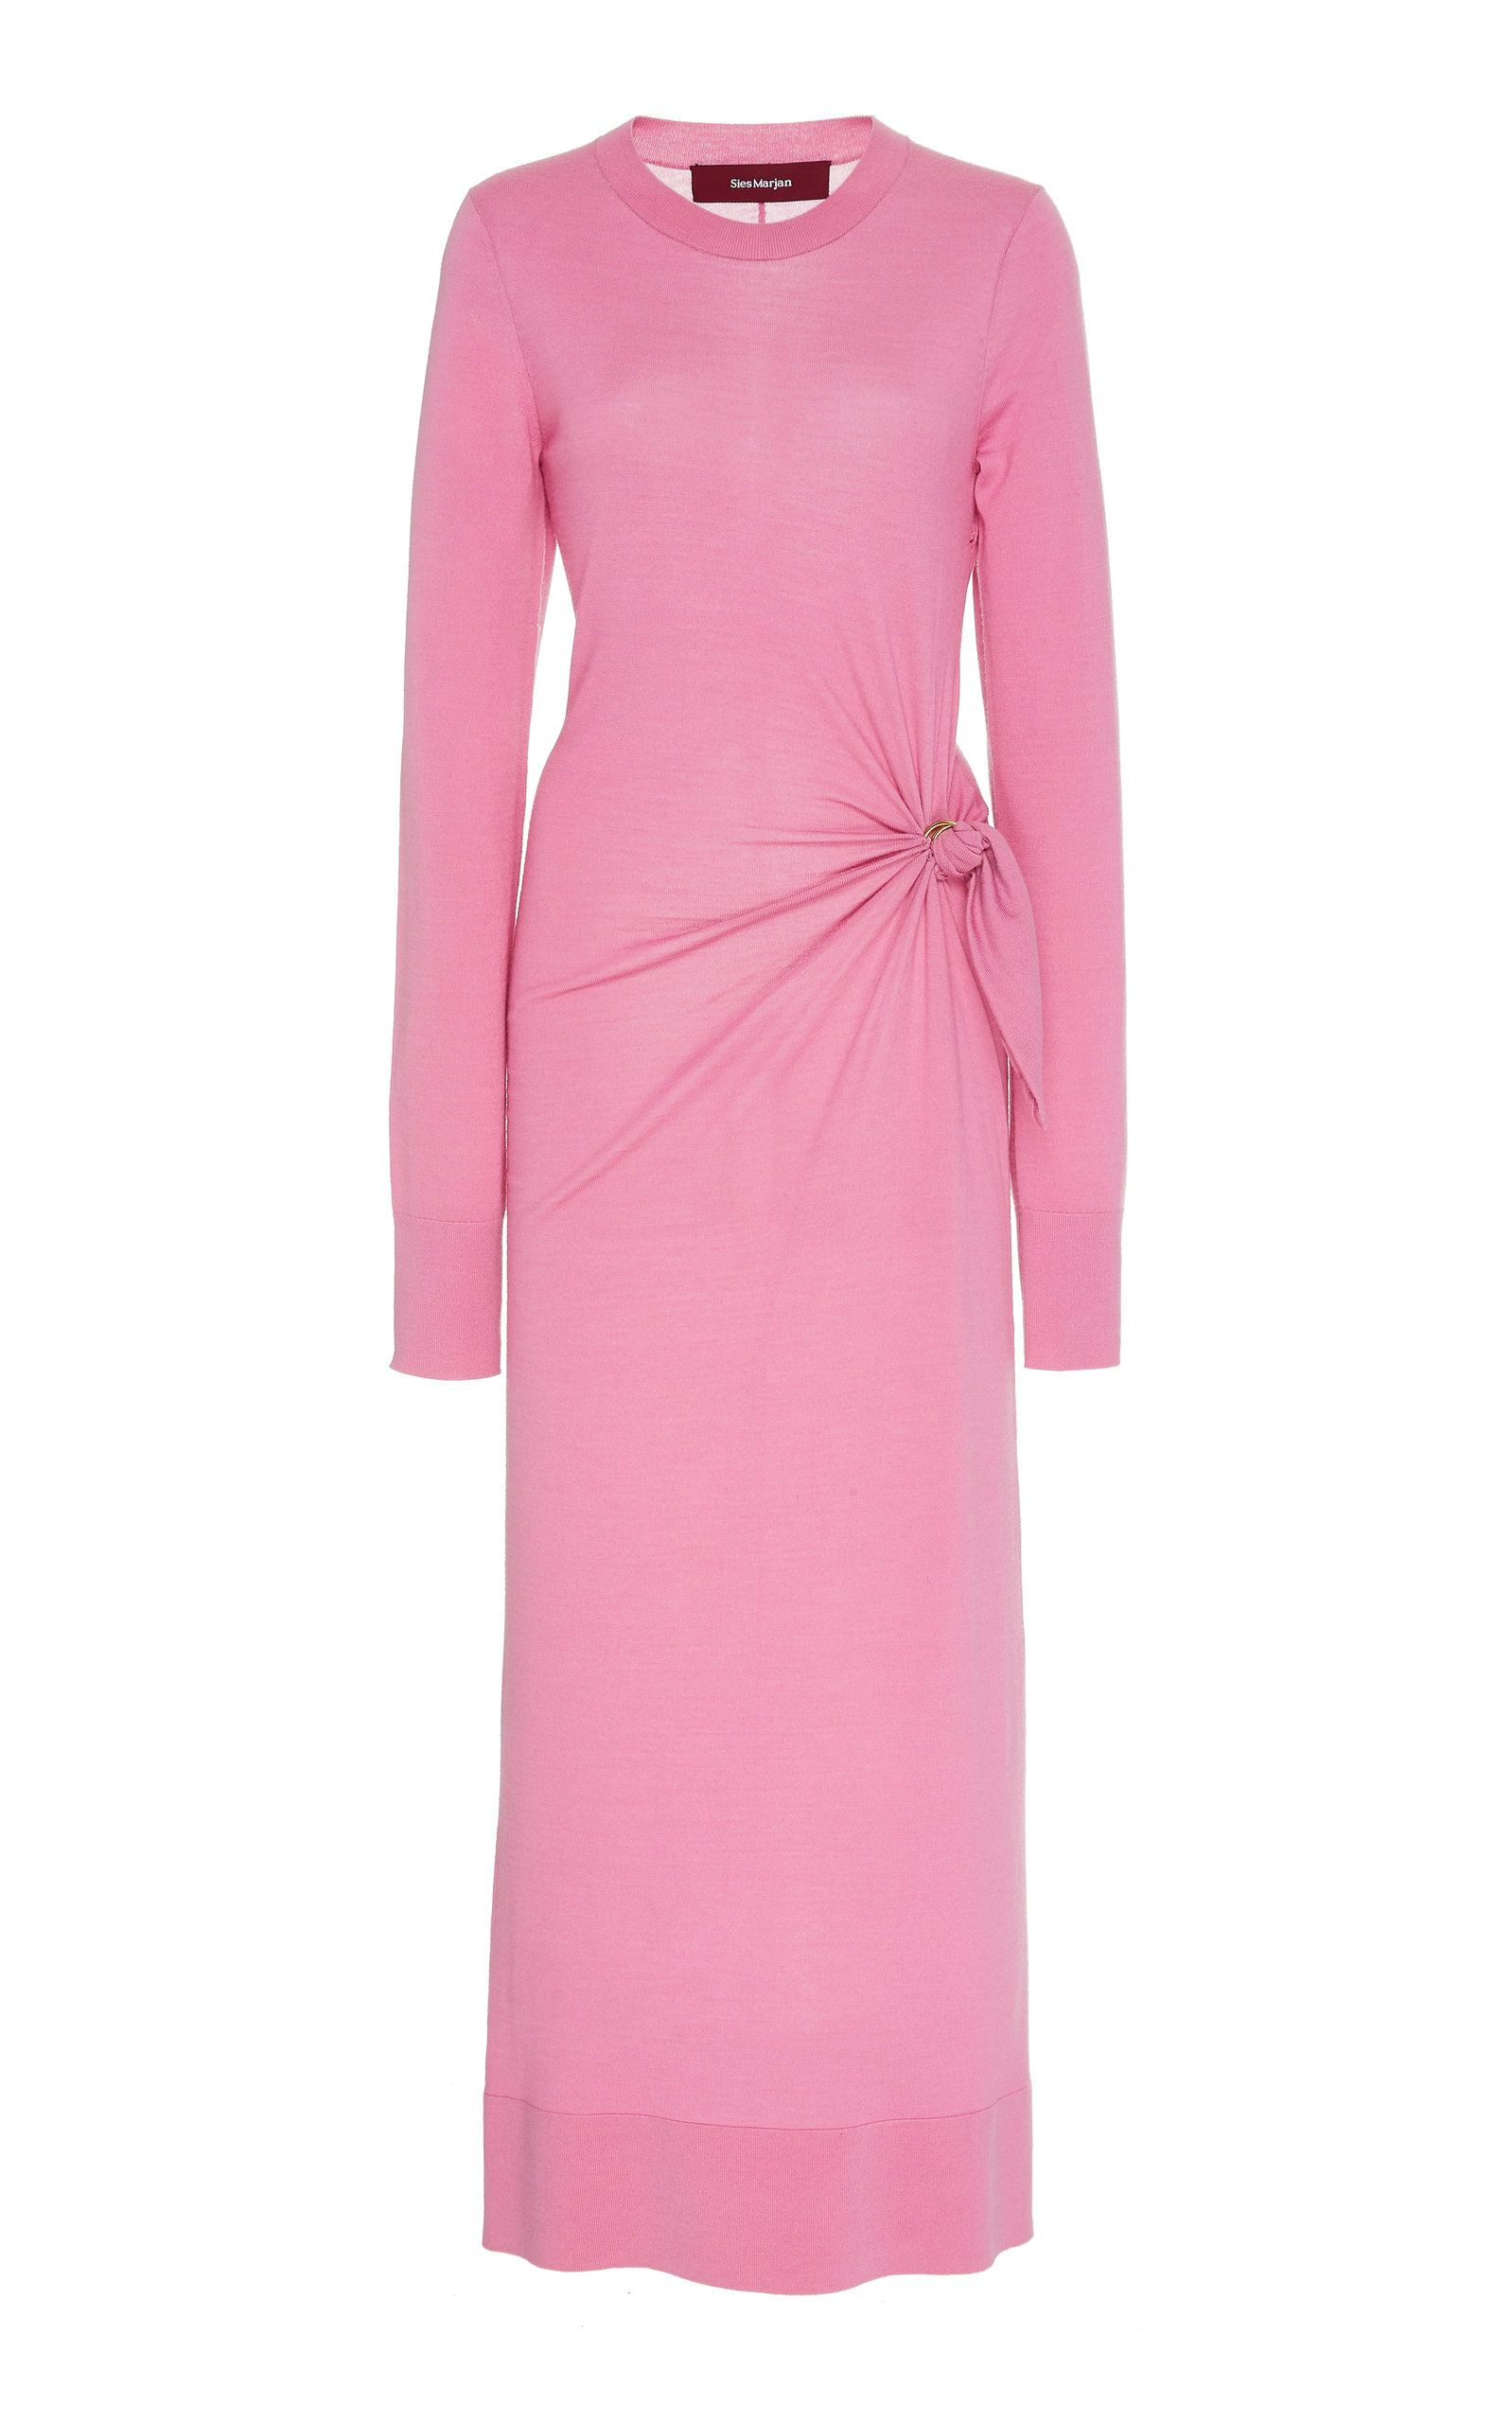 Sies Marjan Selma pink merino wool dress ($795)   Midi